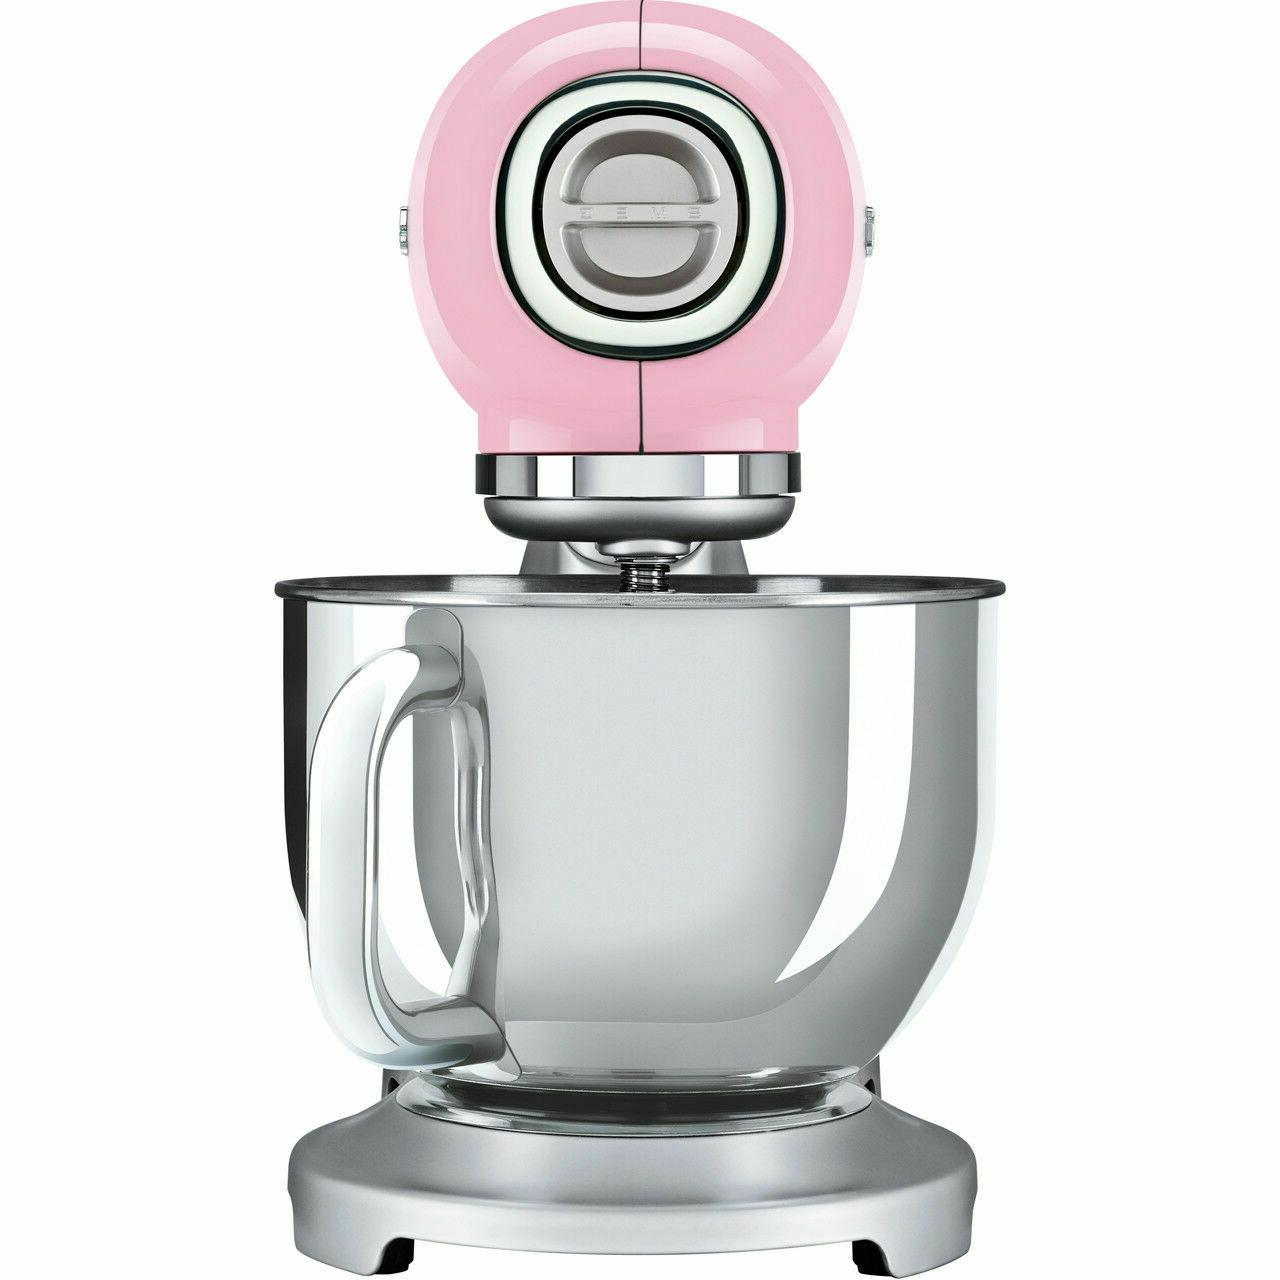 Smeg Pink Retro 50s Stand Mixer 800 Watt 2 Year Guarantee